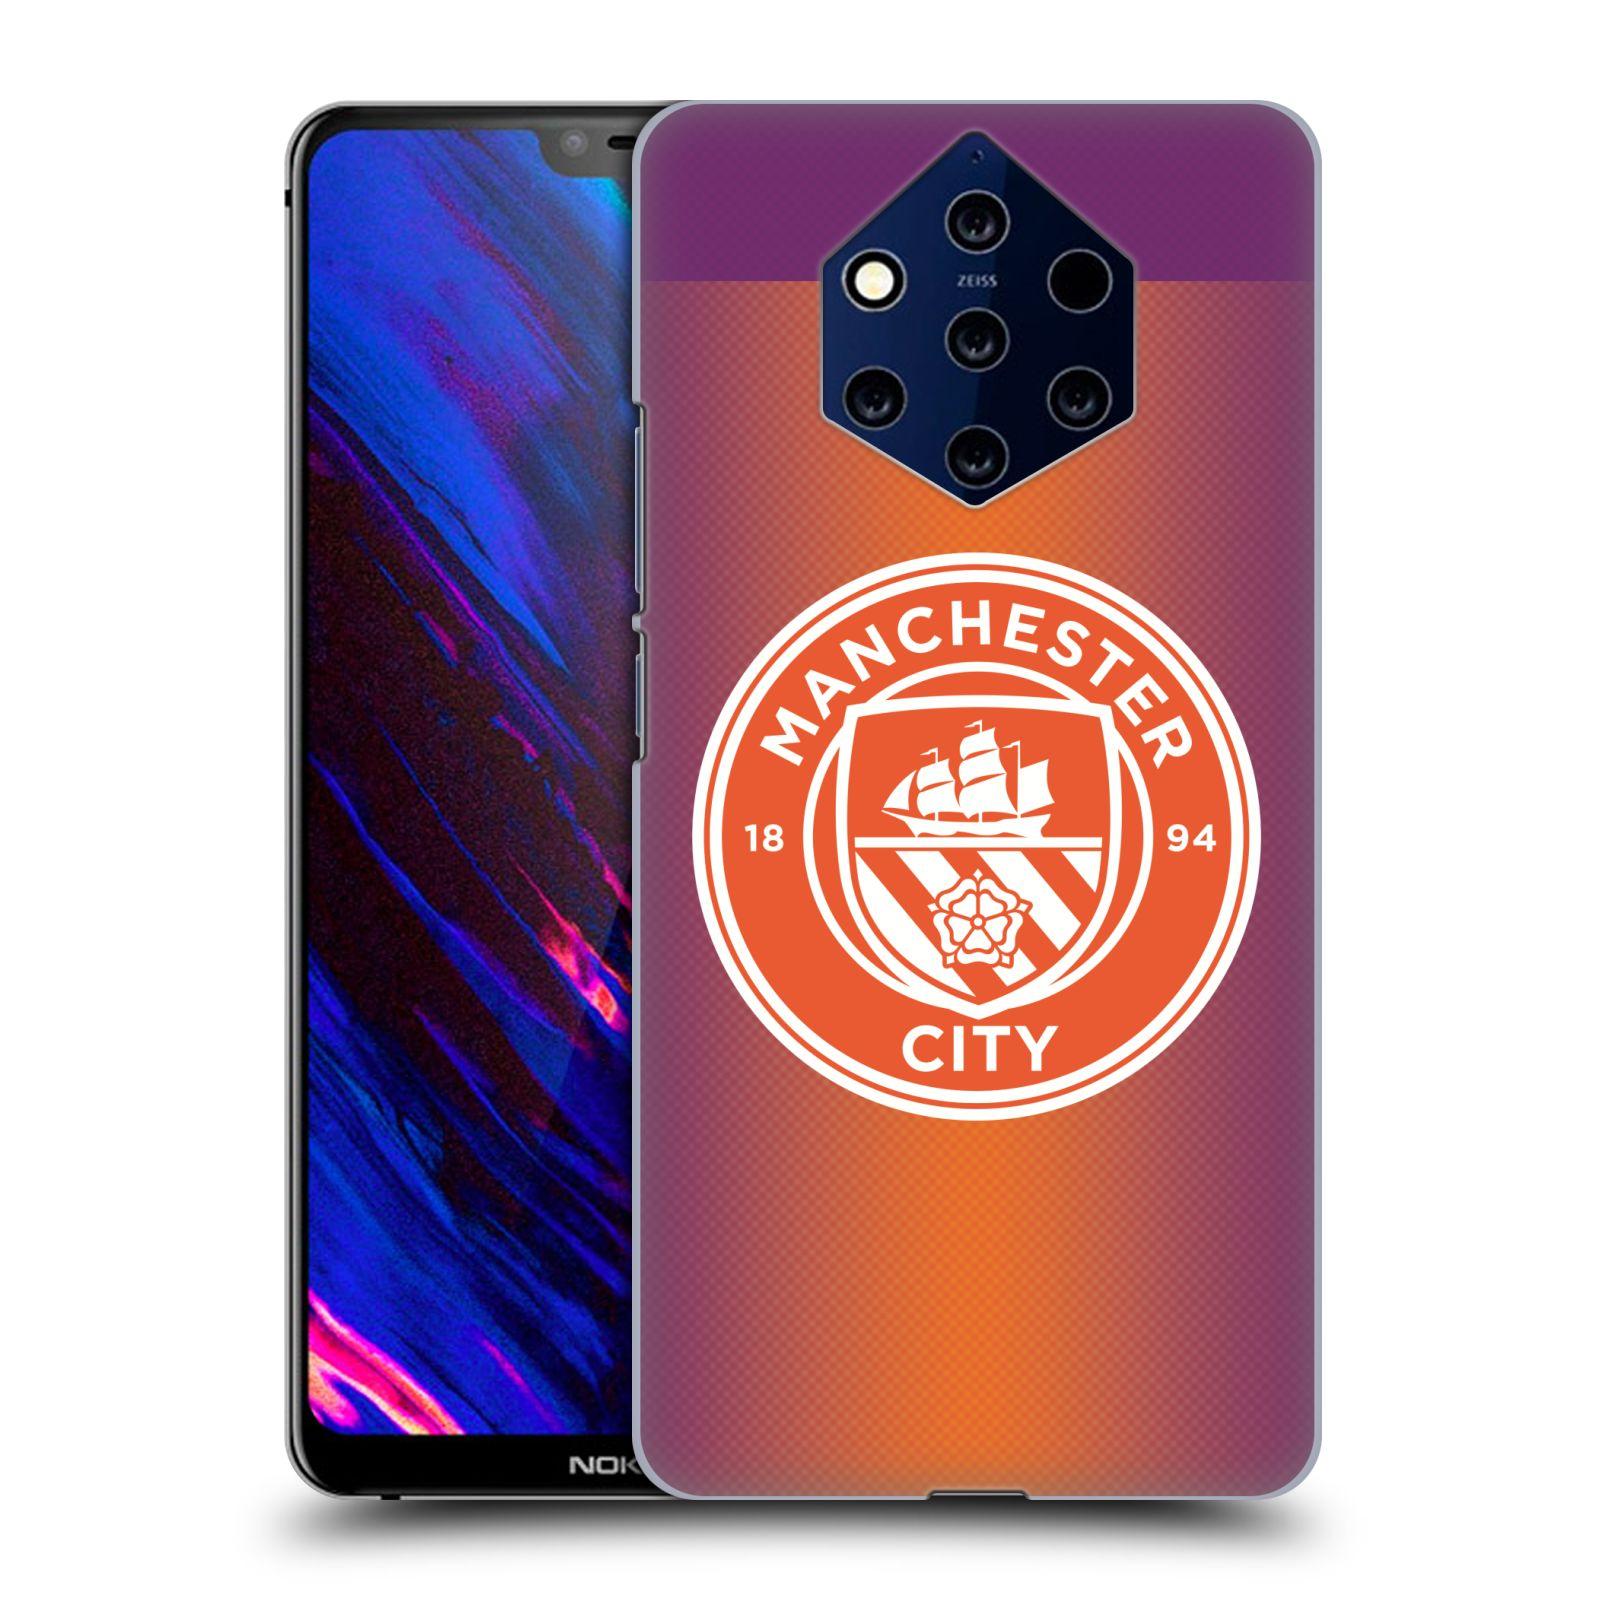 Plastové pouzdro na mobil Nokia 9 PureView - Head Case - Manchester City FC - Oranžové nové logo